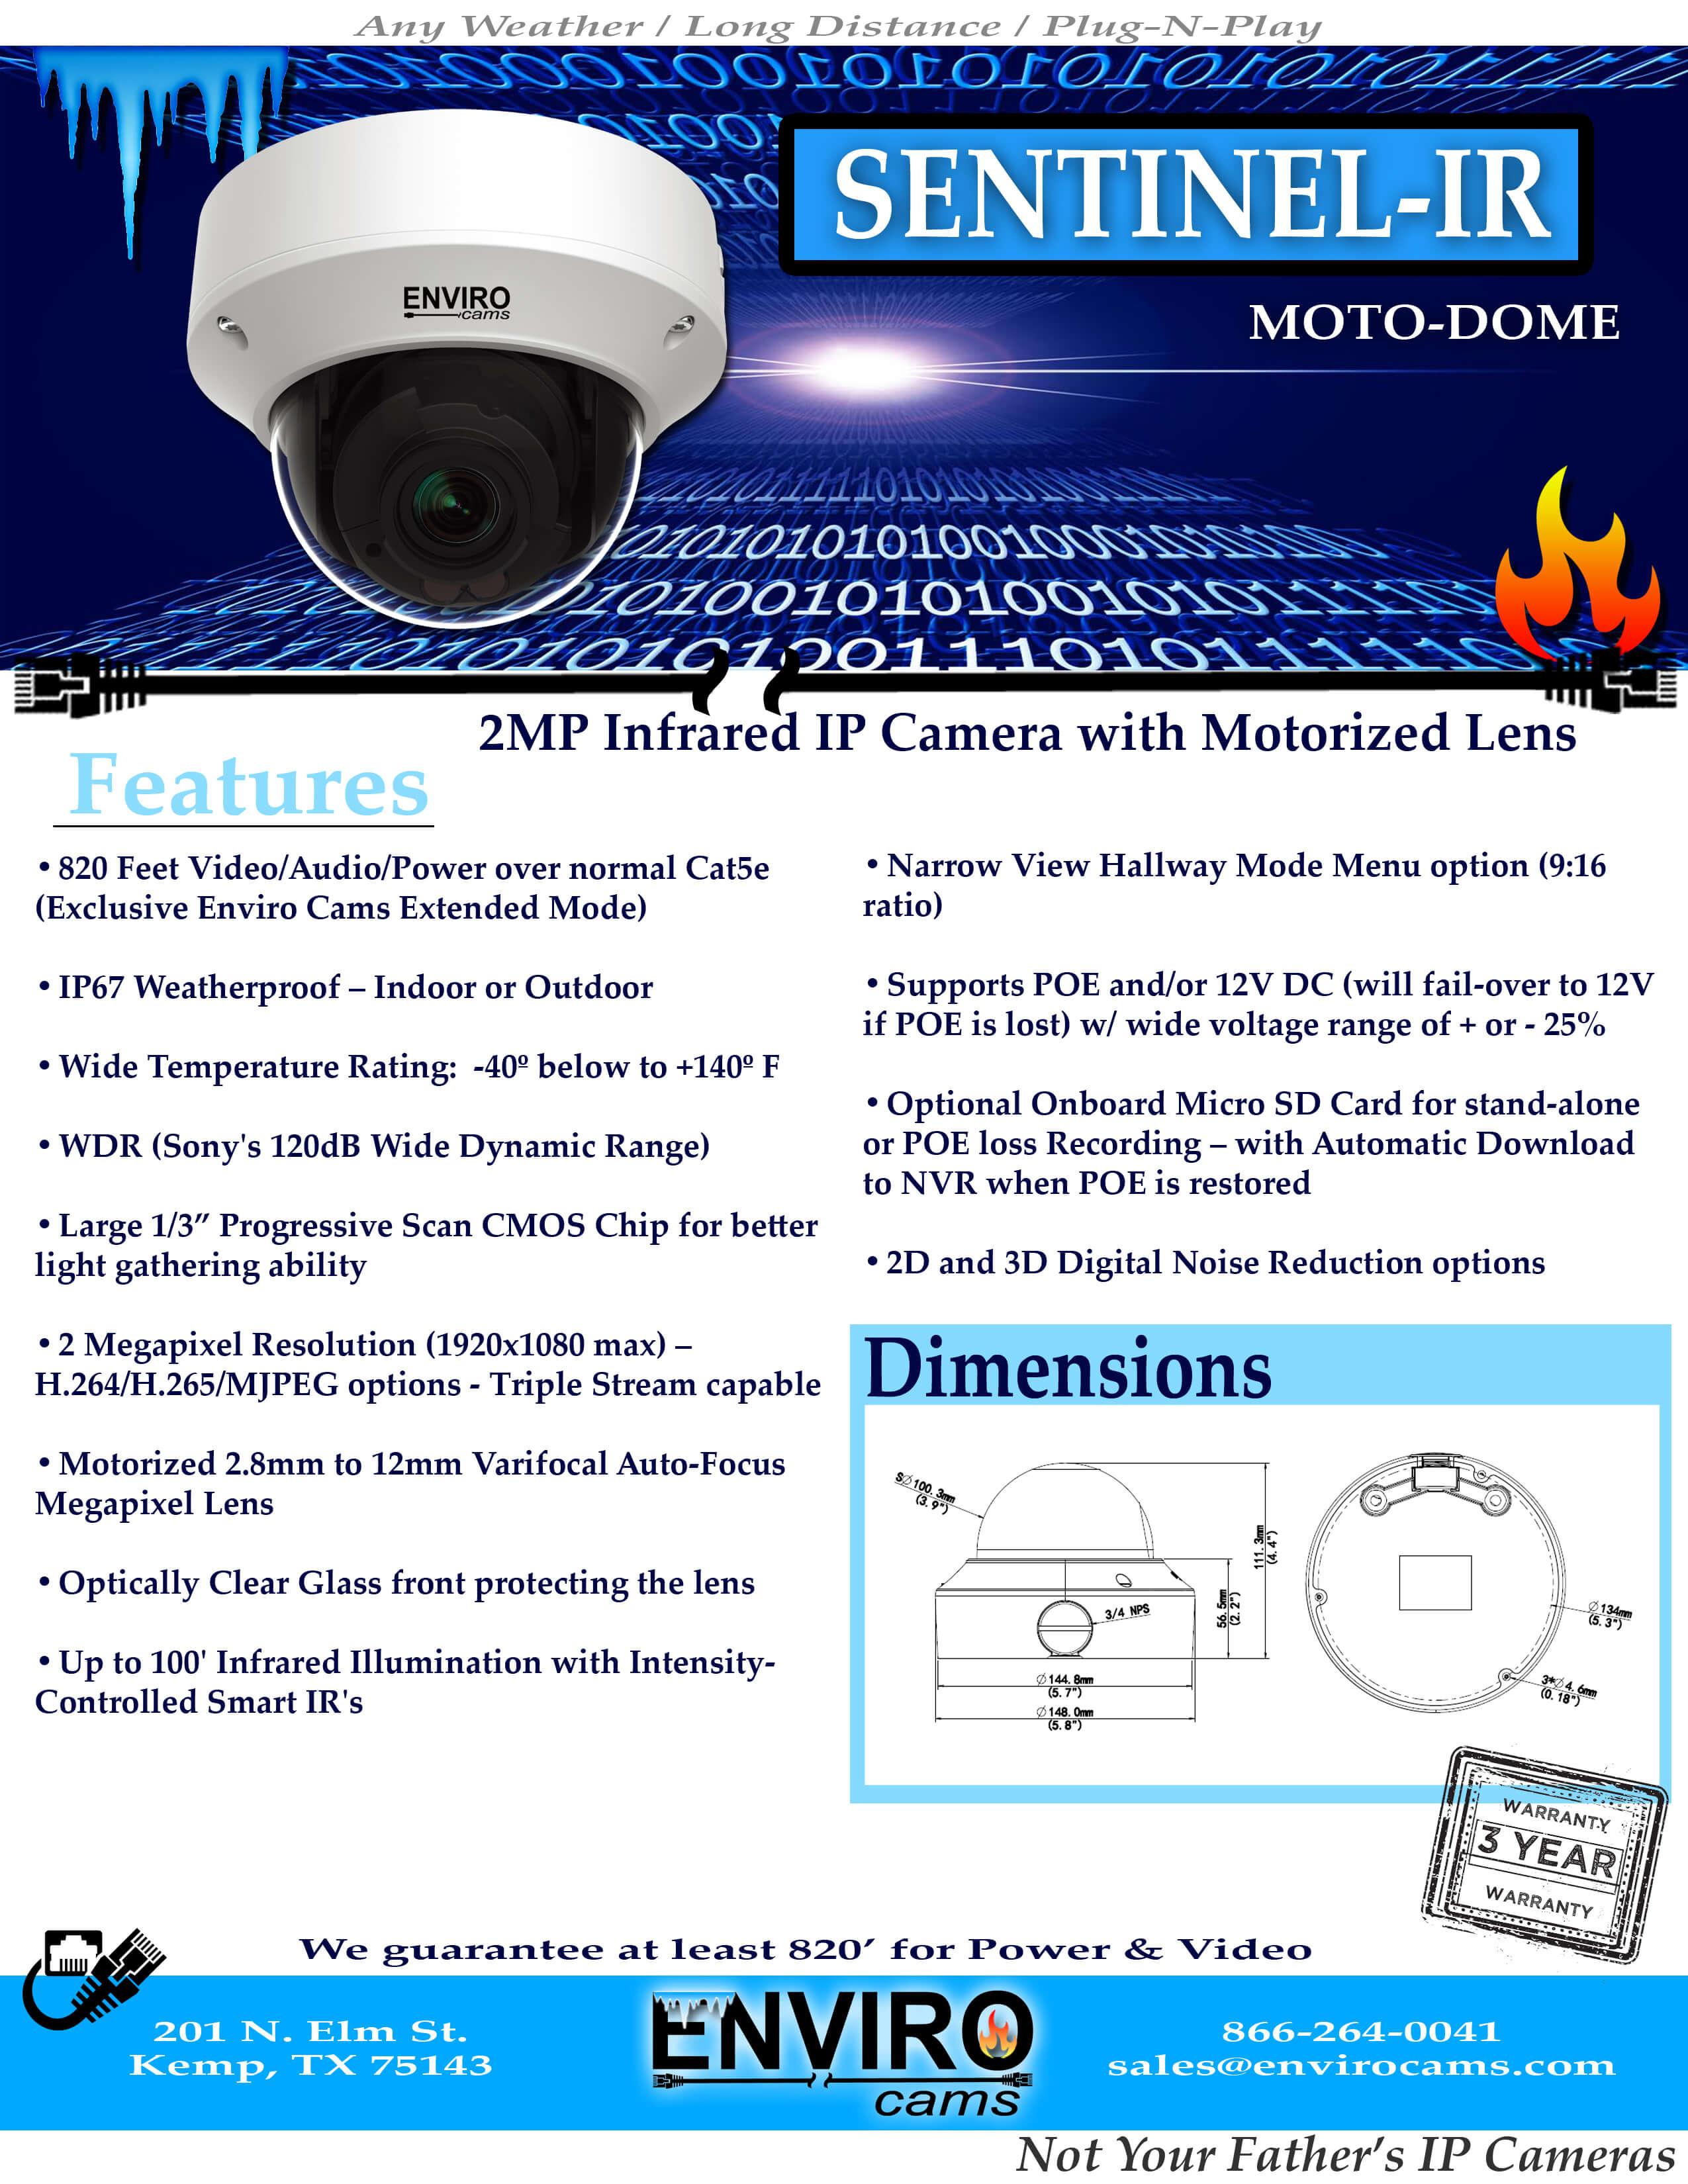 SentinelIRSpecPage1 - Sentinel-IR Moto-Dome